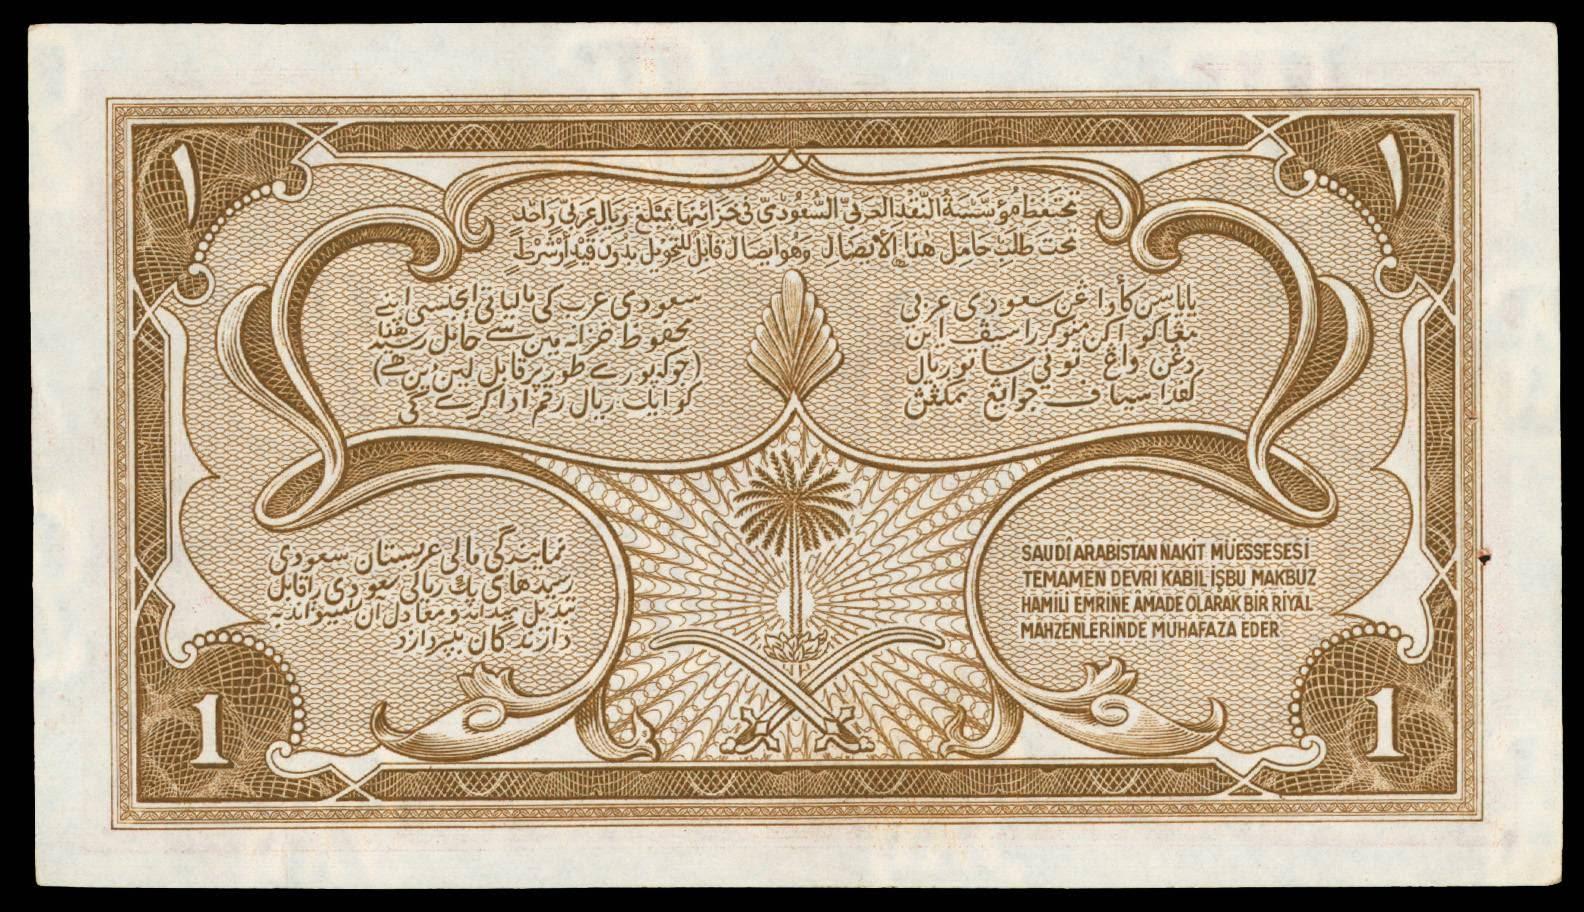 Saudi Arabia money currency One Riyal